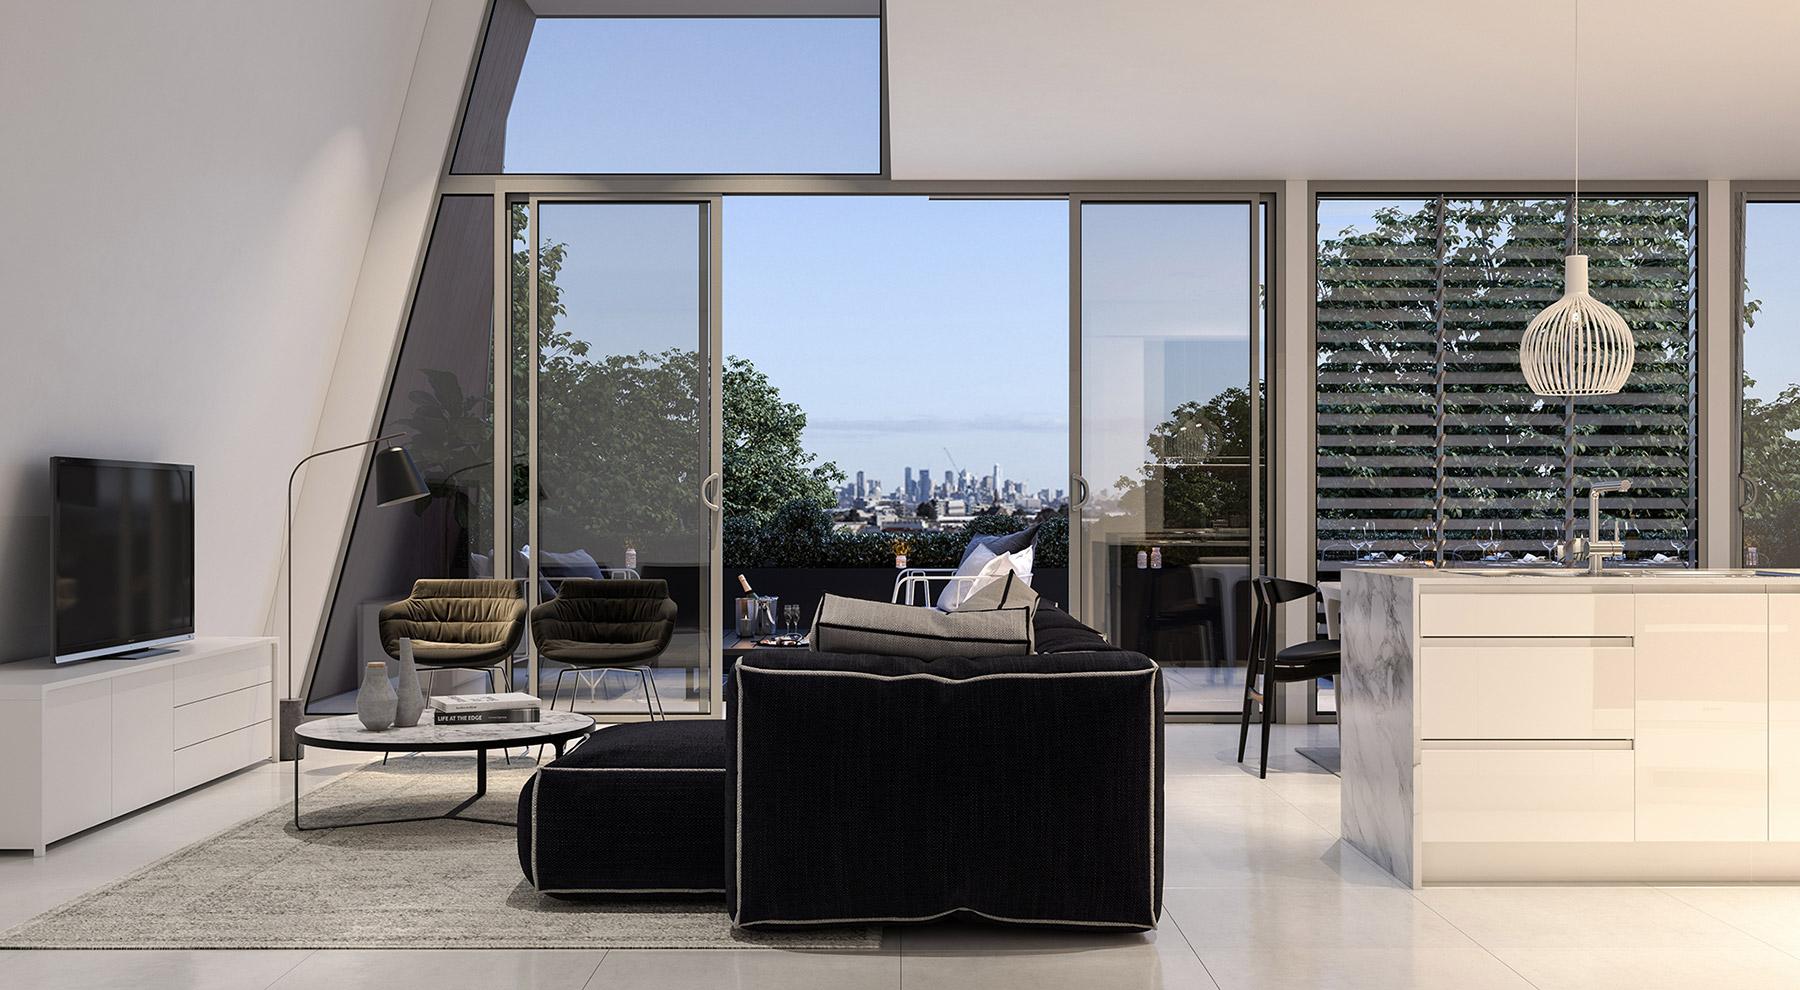 ScreenAge-3D-rendering-apartment-internal-living